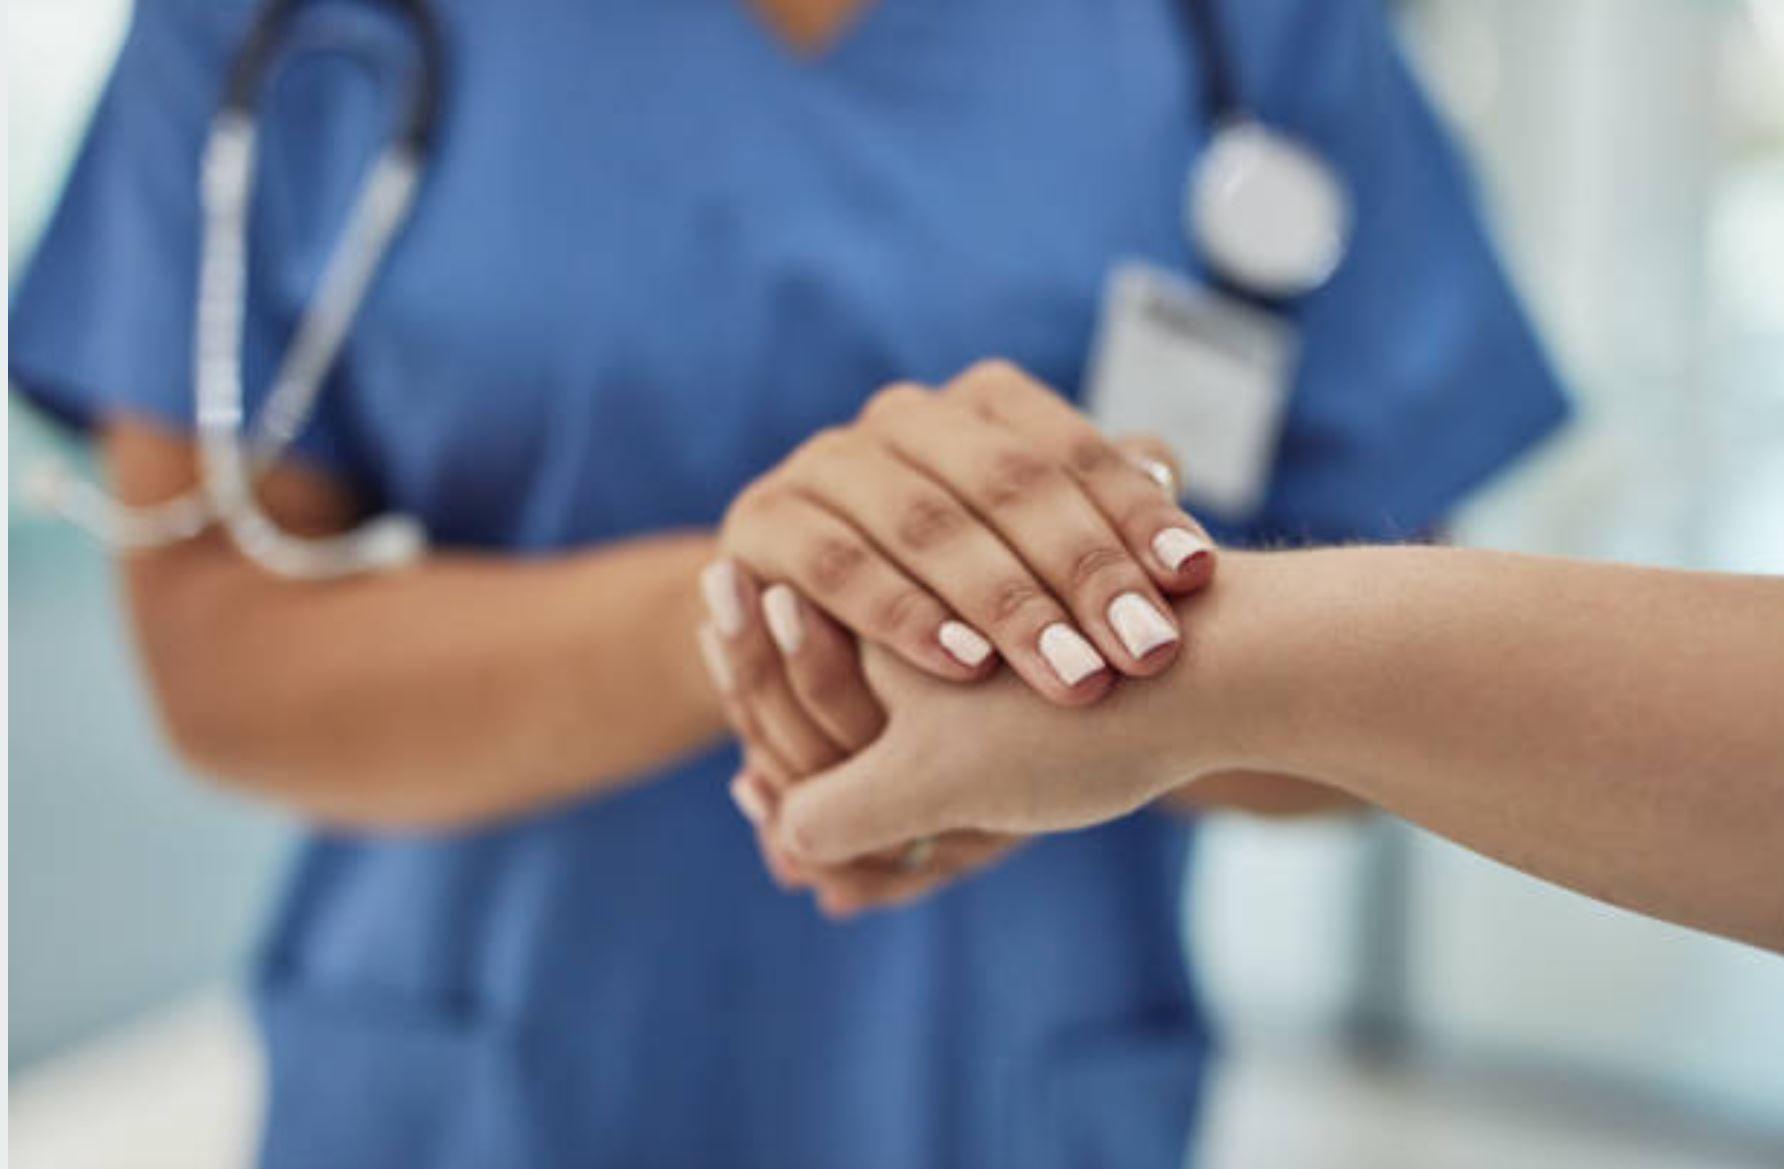 As a Nurse, CCAM means....